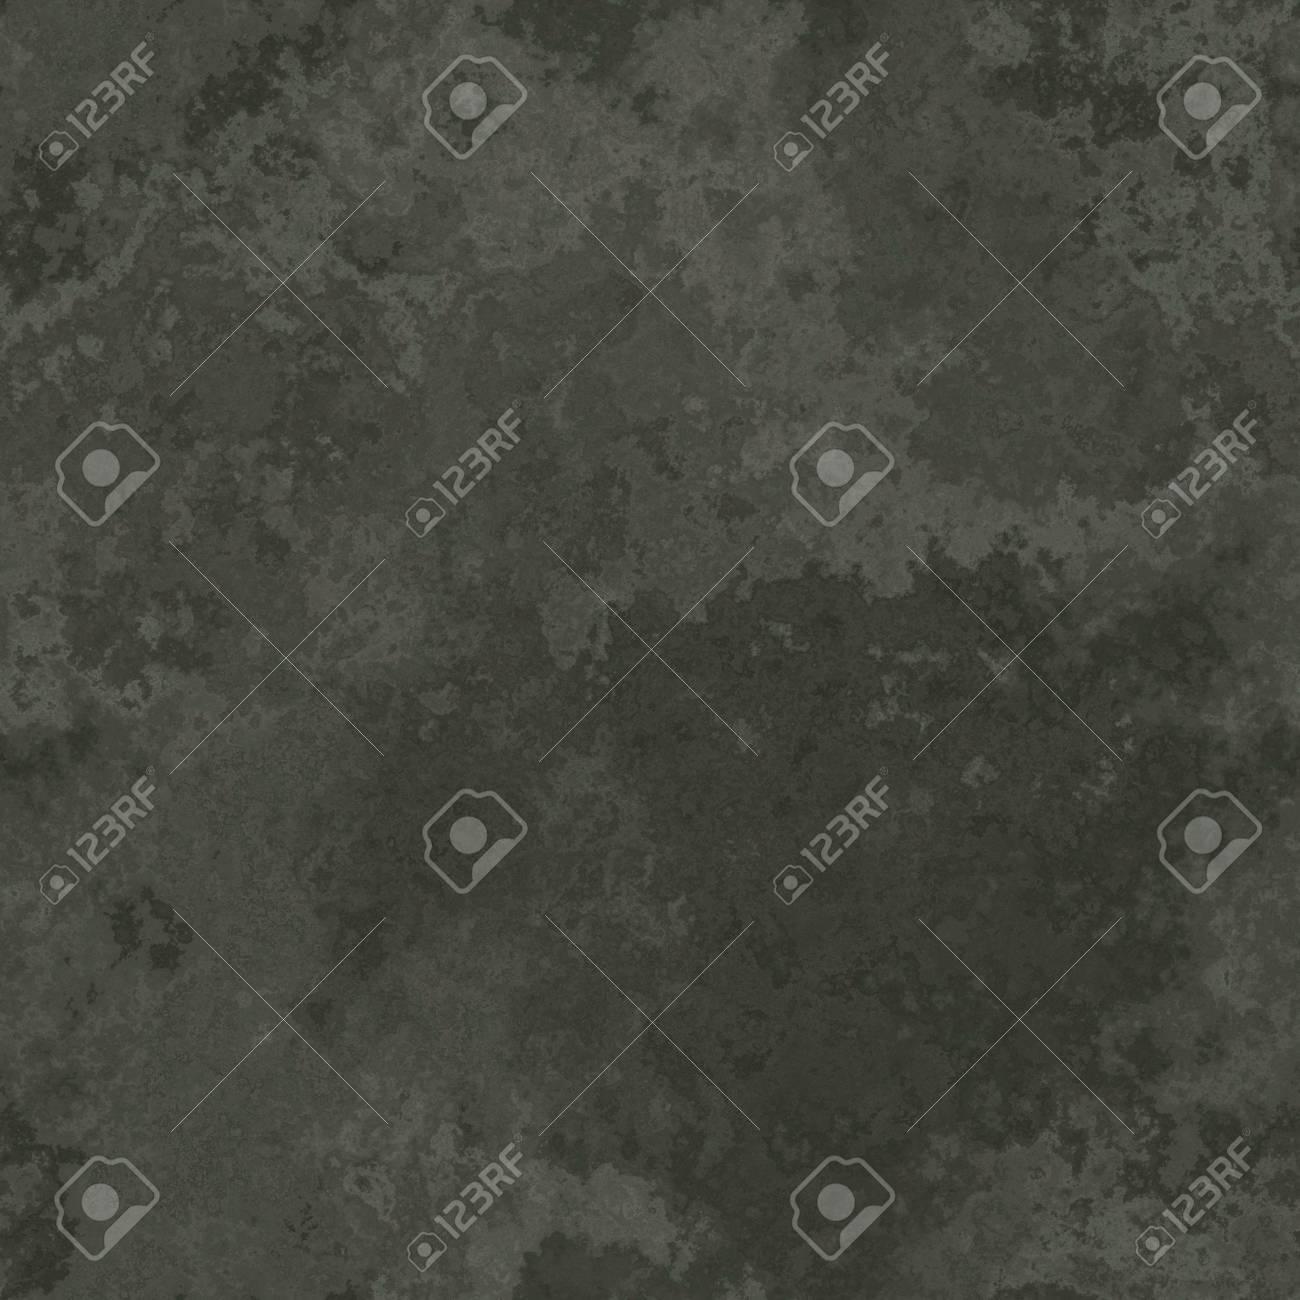 Kachel textur  Marmor Material Textur Hintergrundmuster Für Kachel Nahtlose ...